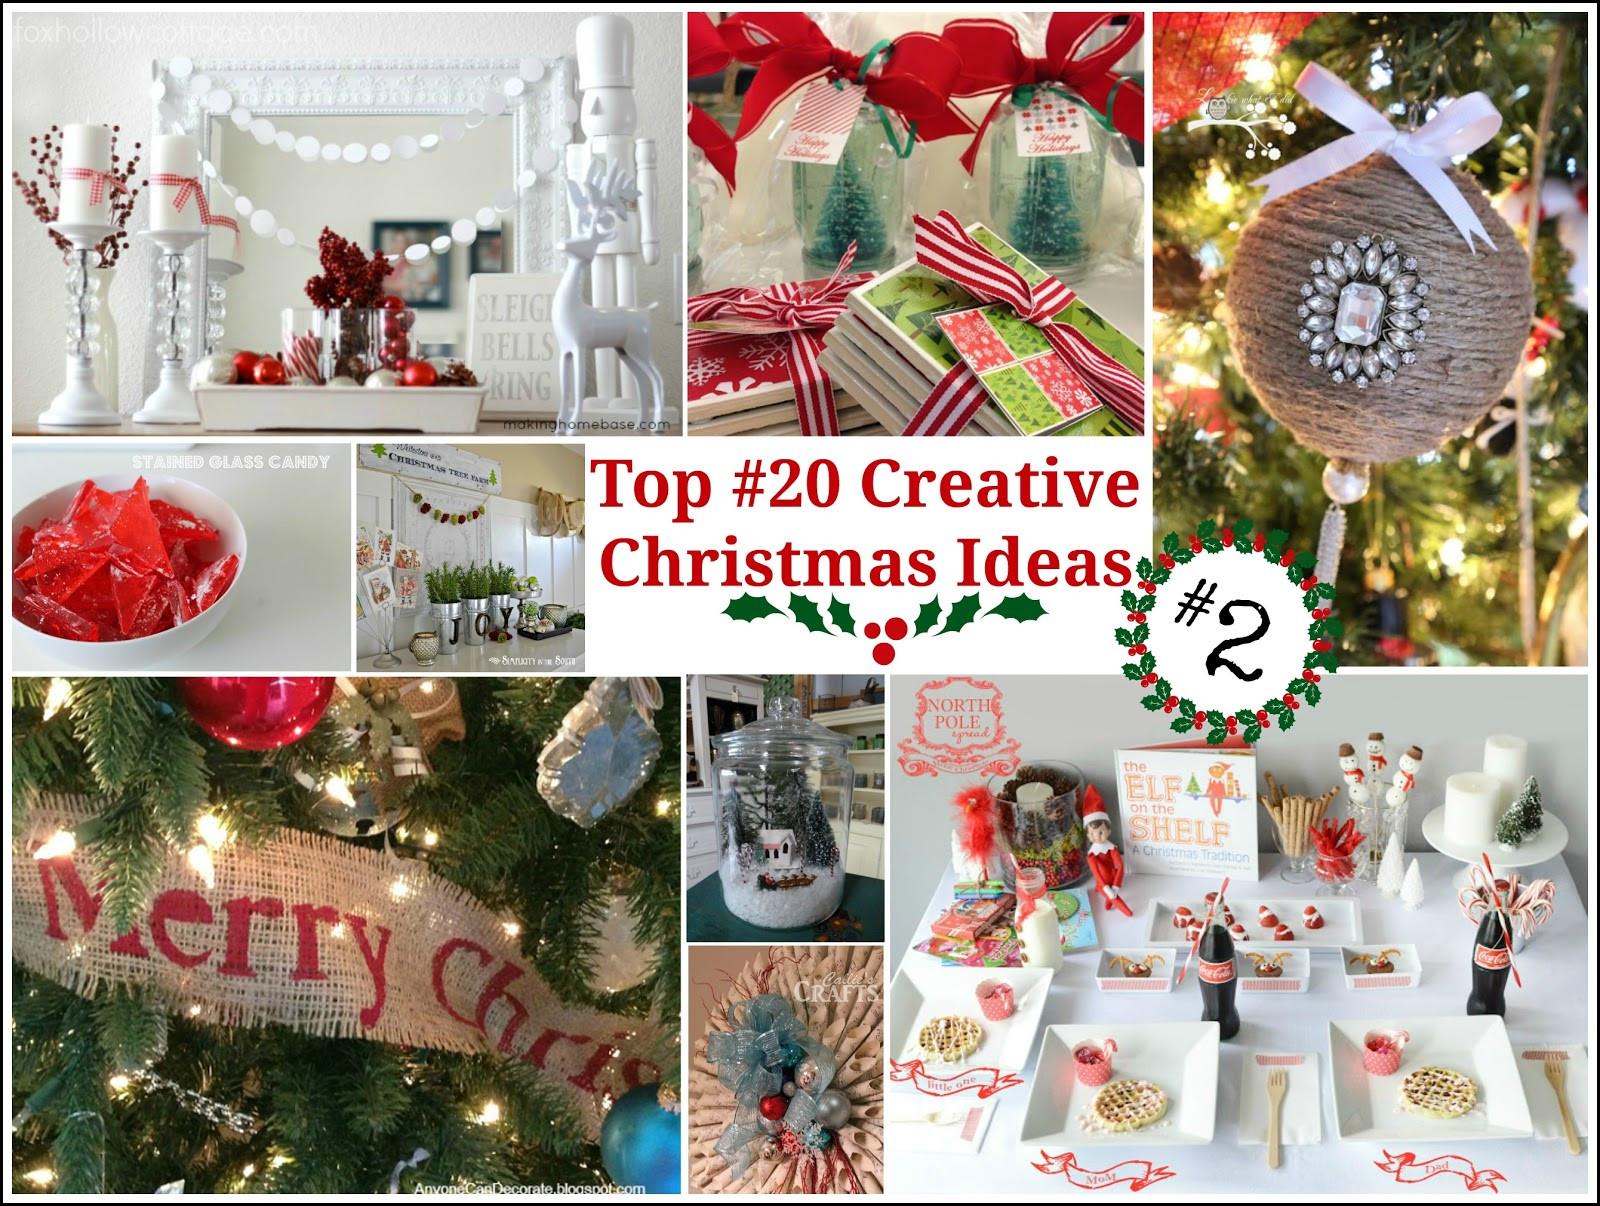 Pinterest Christmas Party Ideas  Top 20 Creative Christmas Ideas II Fox Hollow Cottage